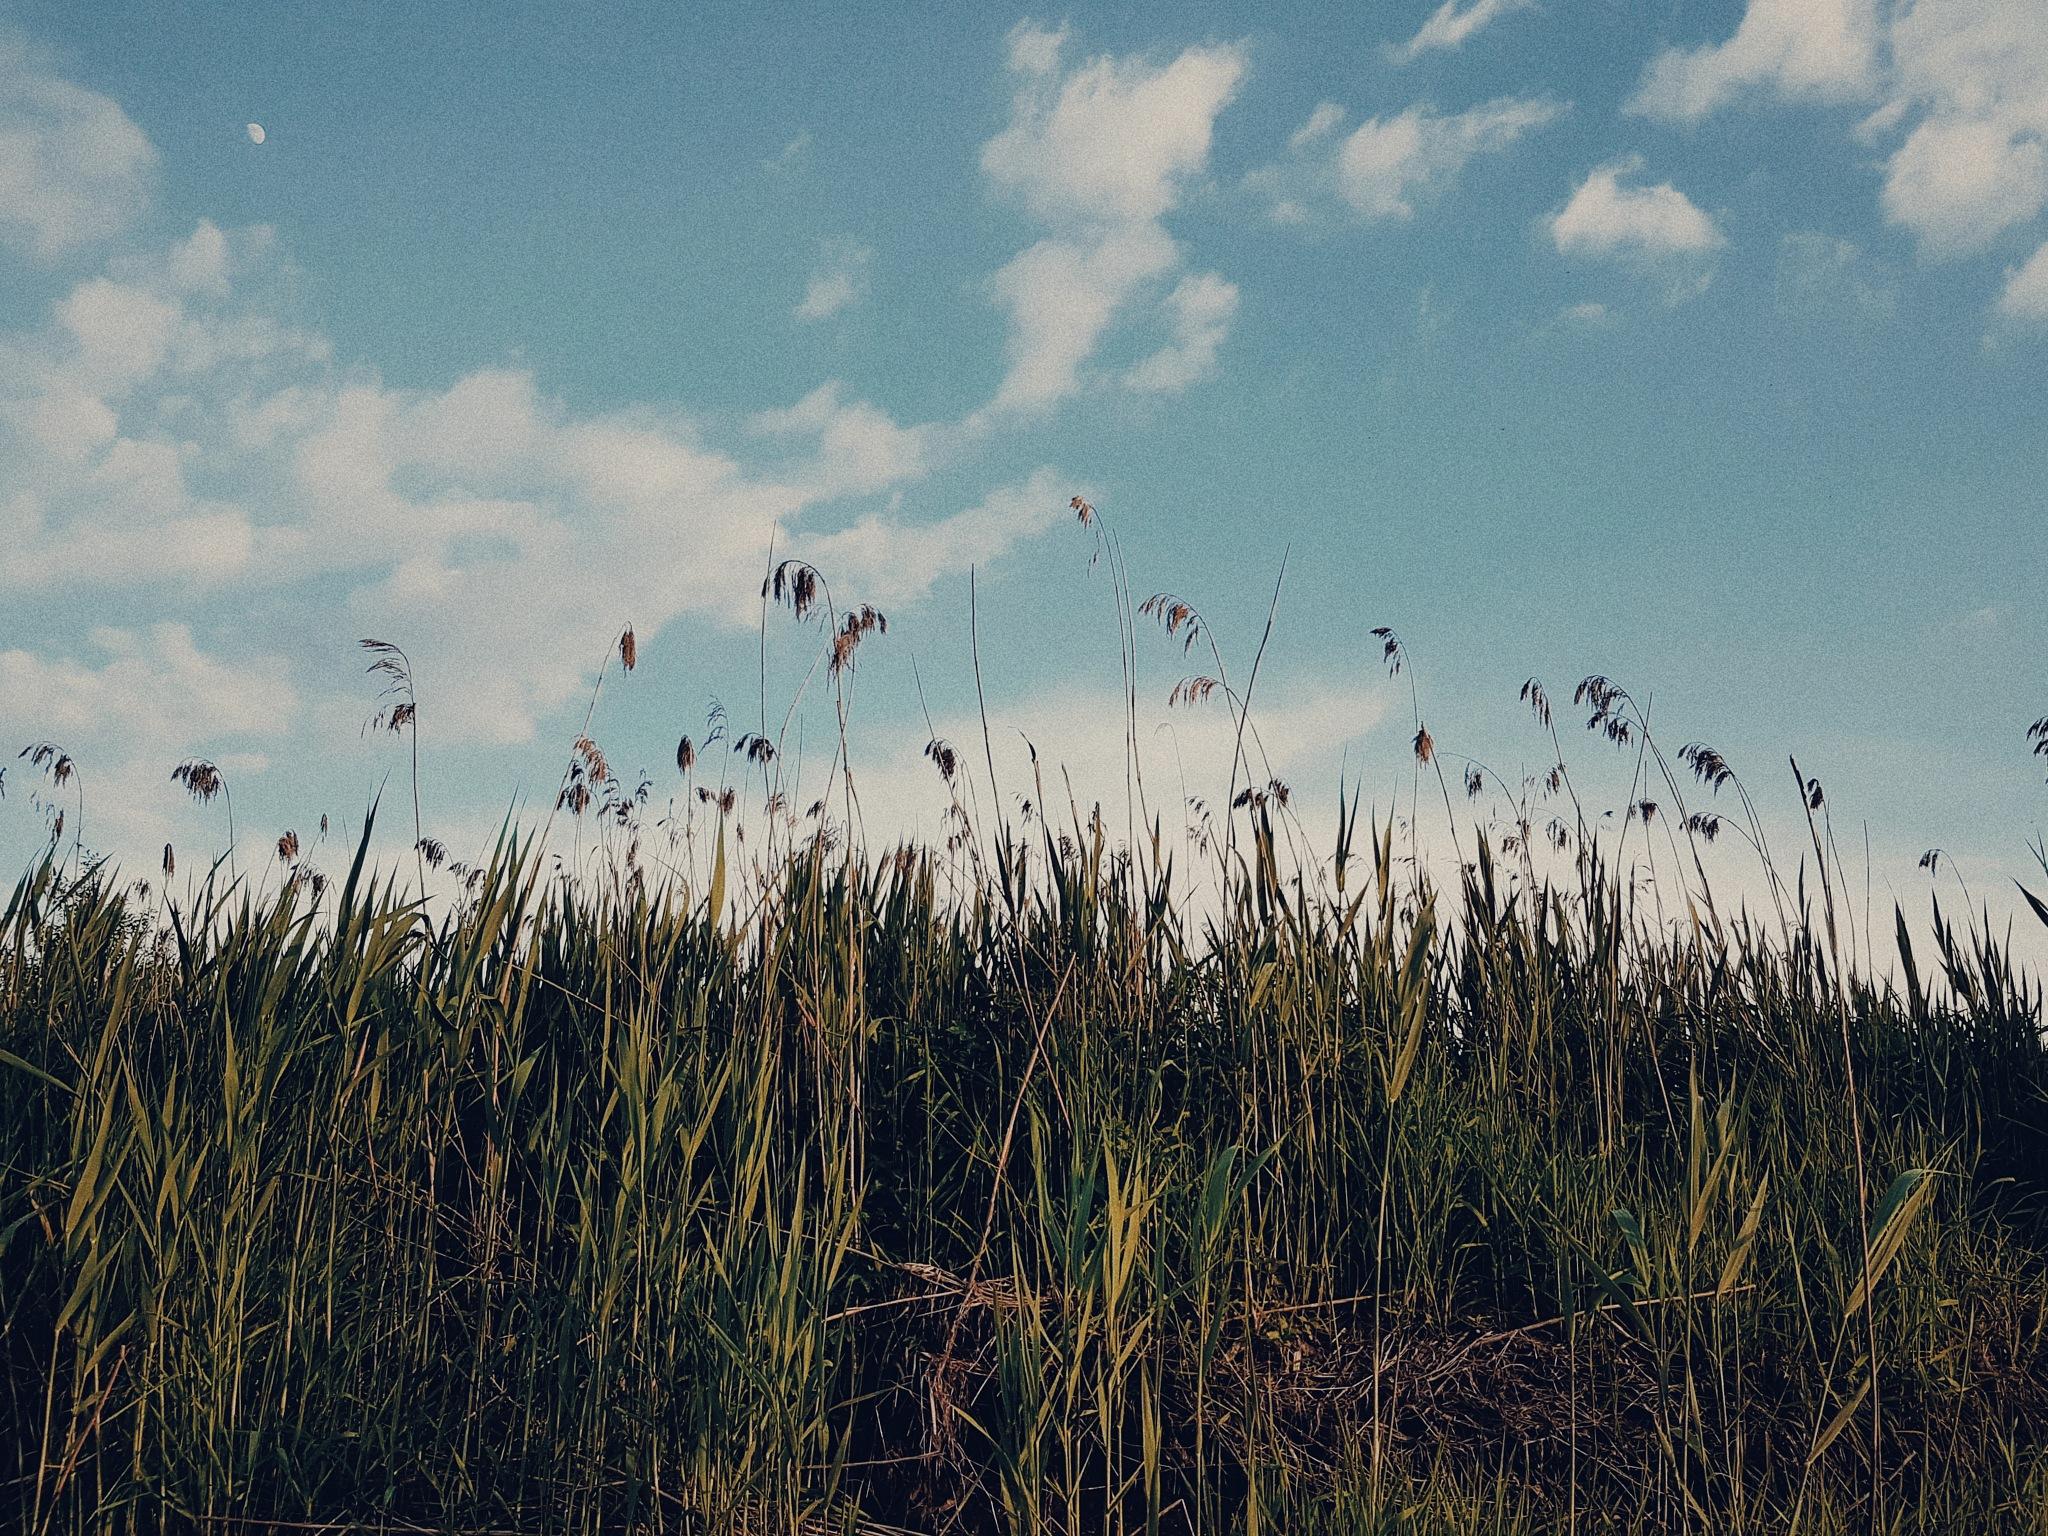 Fields Of Lithuania by Vėja Viliūnaitė